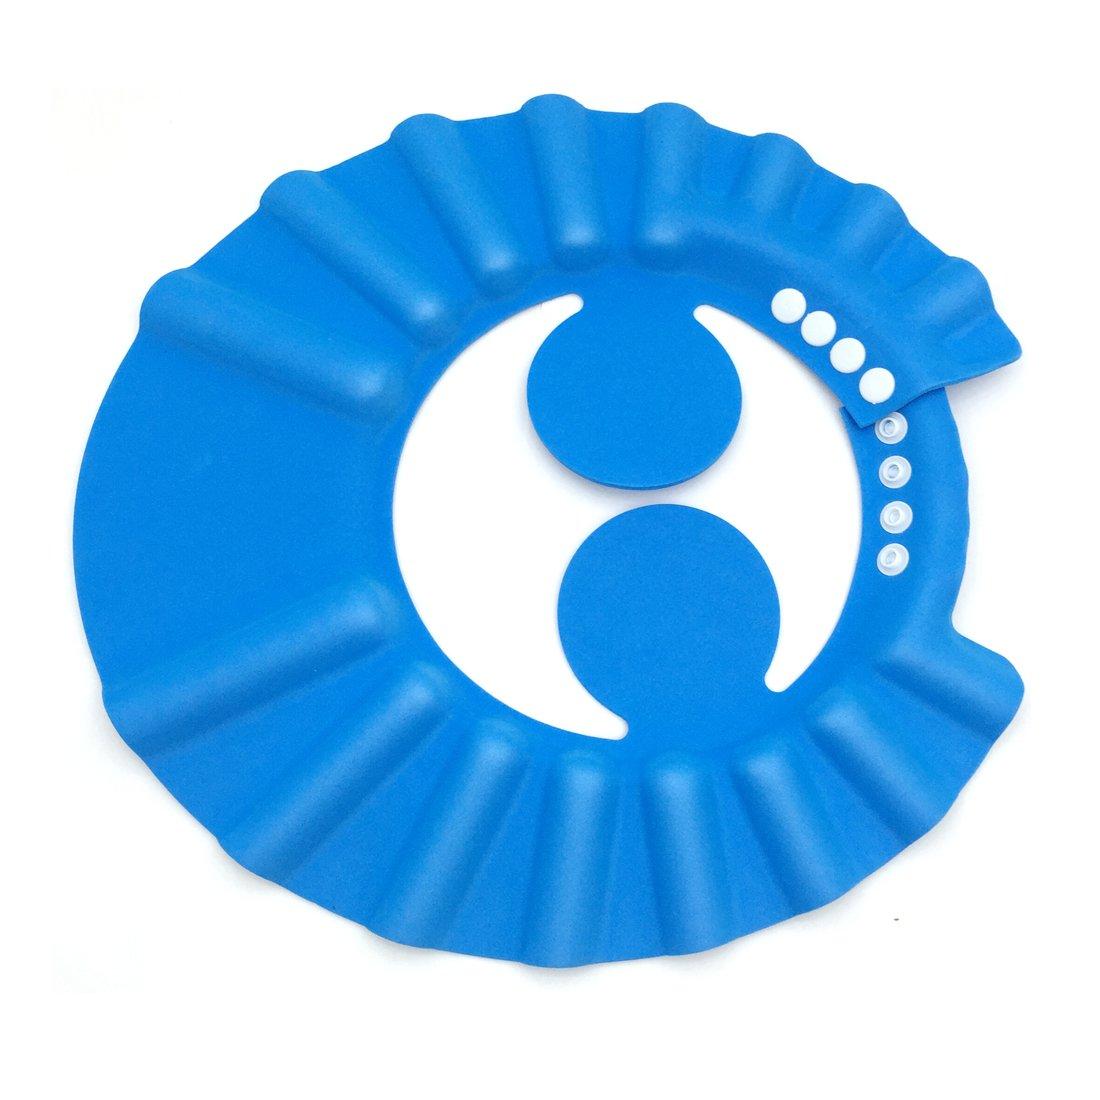 294154d86 Cheap Baby Bath Visor, find Baby Bath Visor deals on line at Alibaba.com